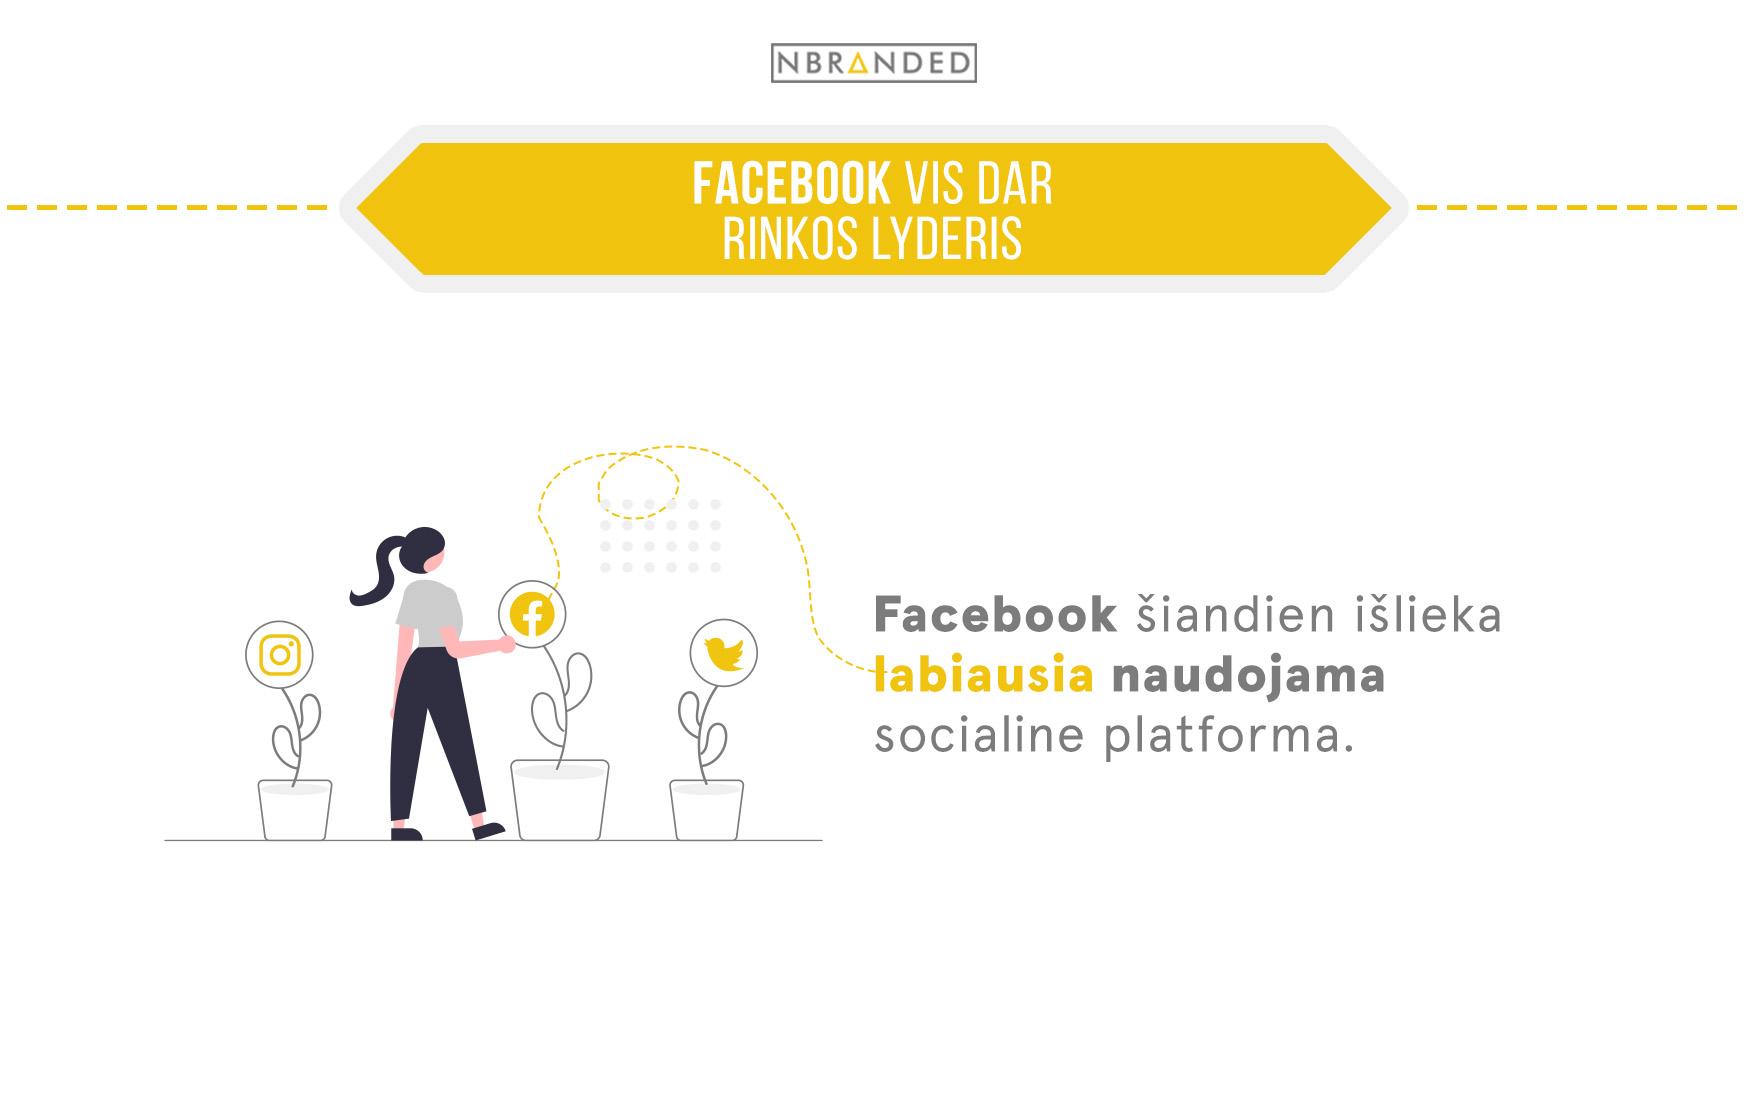 facebook rinkos lyderis